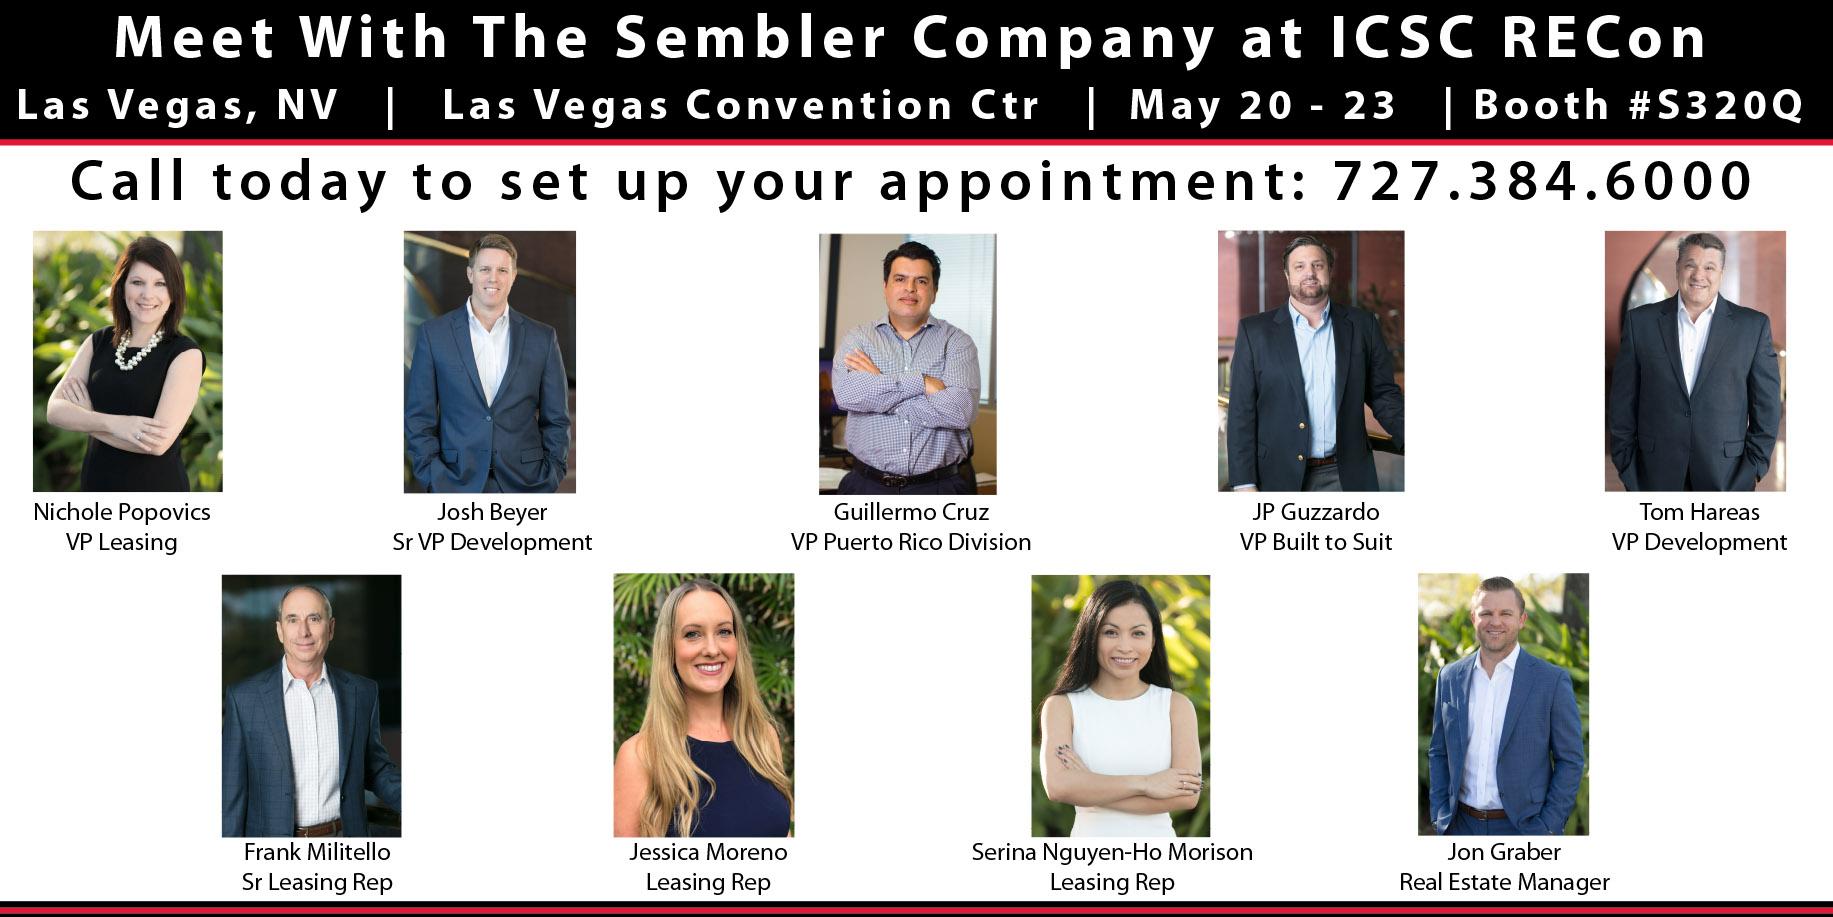 Meet With Sembler at ICSC RECon 2018